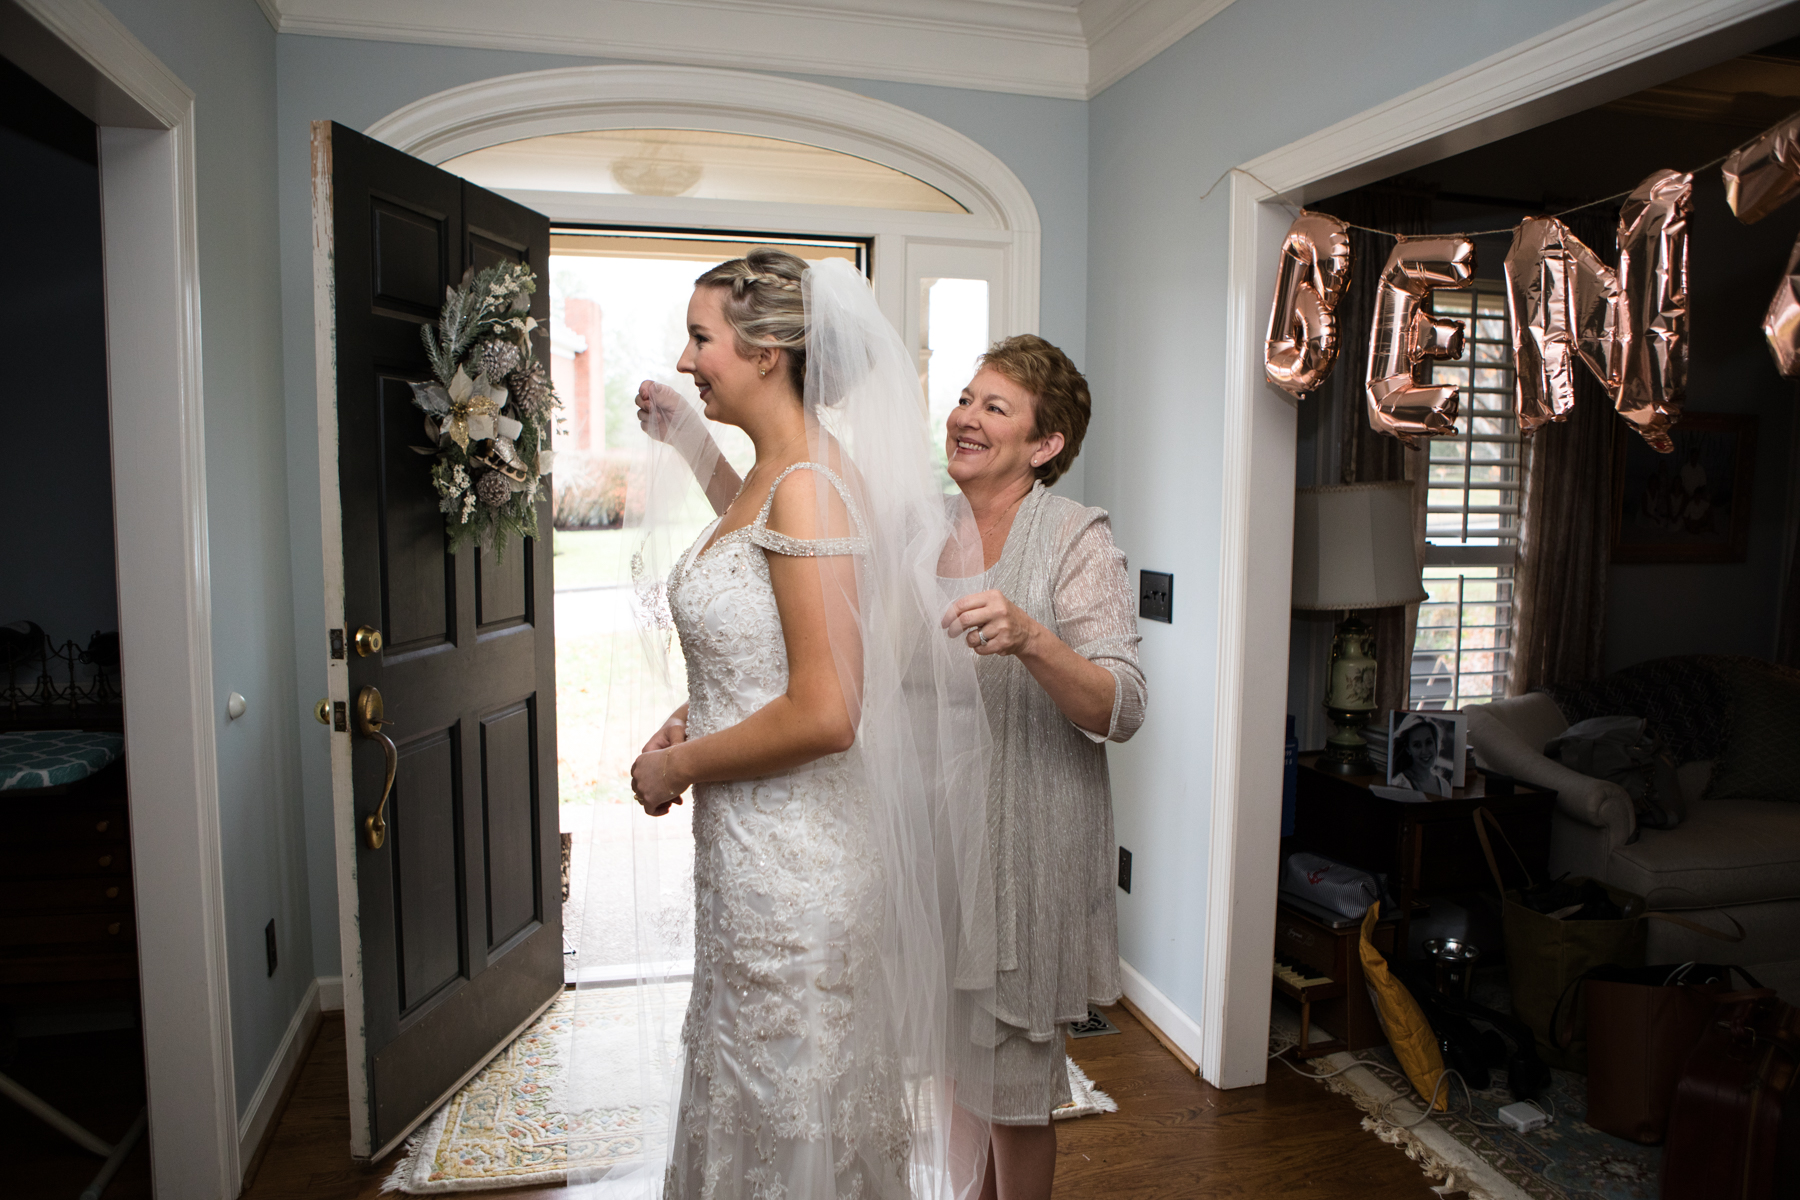 Kelli-and-Matt-Nashville-Wedding-Sneak-Peak-0068.jpg